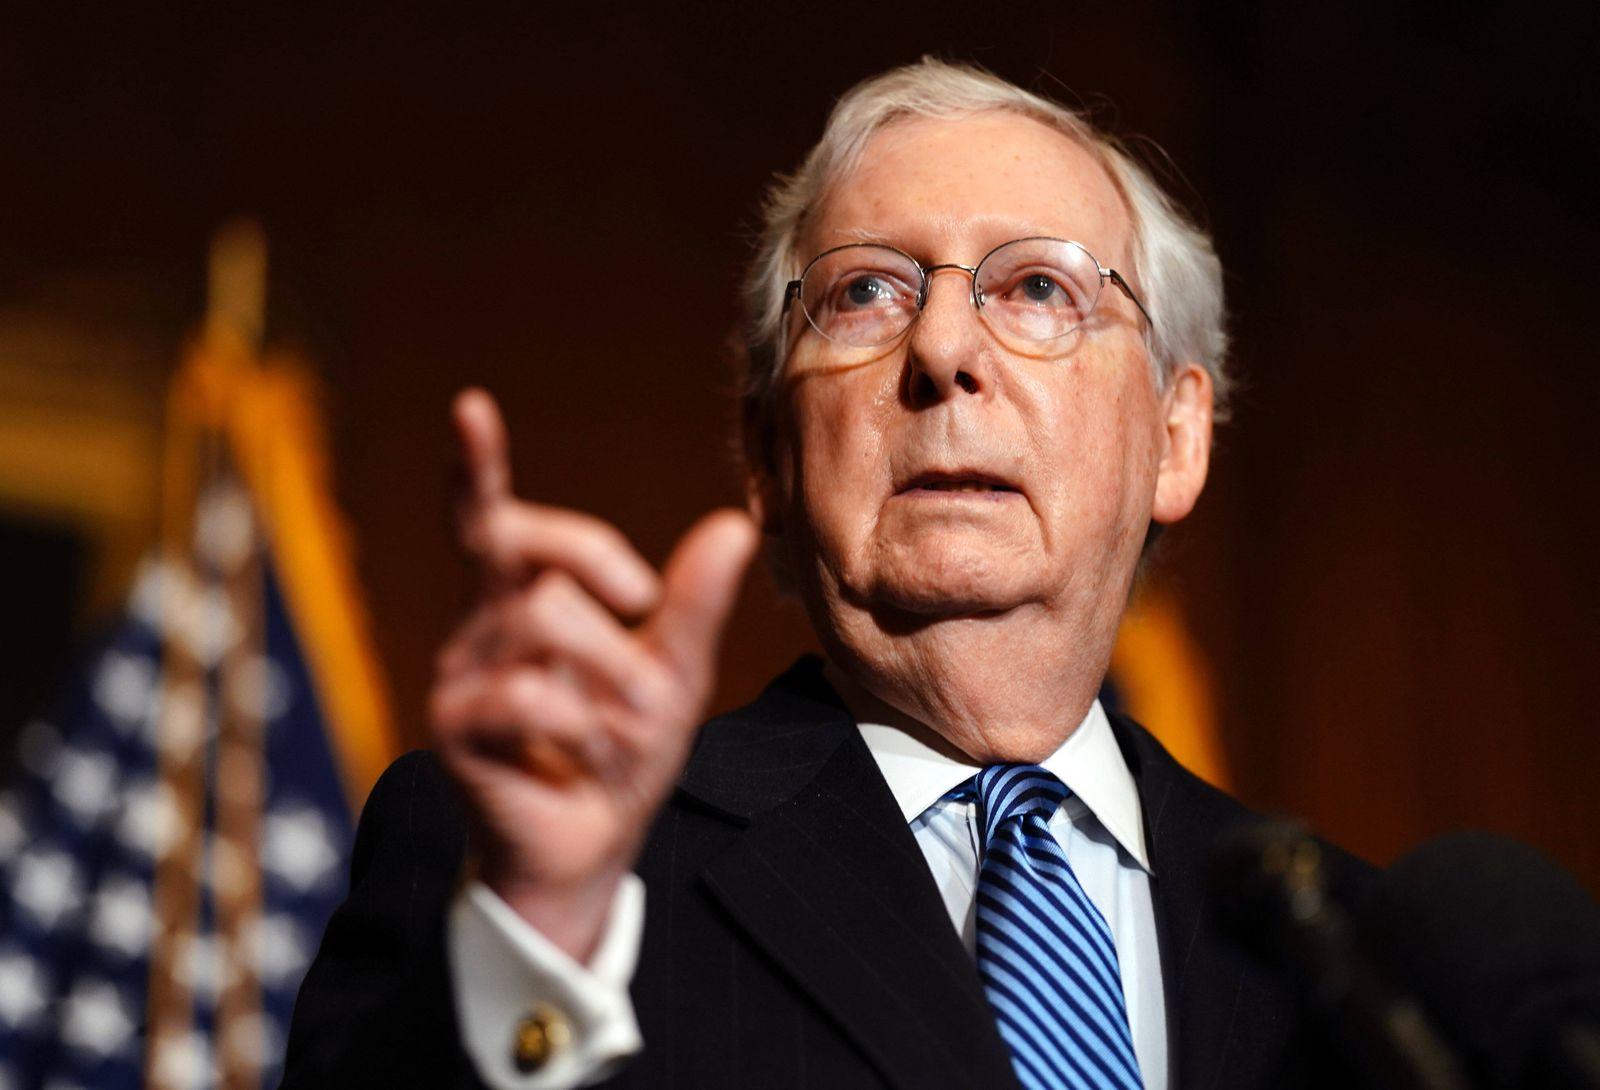 December 8, 2020, Washington, District of Columbia, USA: United States Senate Majority Leader Mitch McConnell (Republic